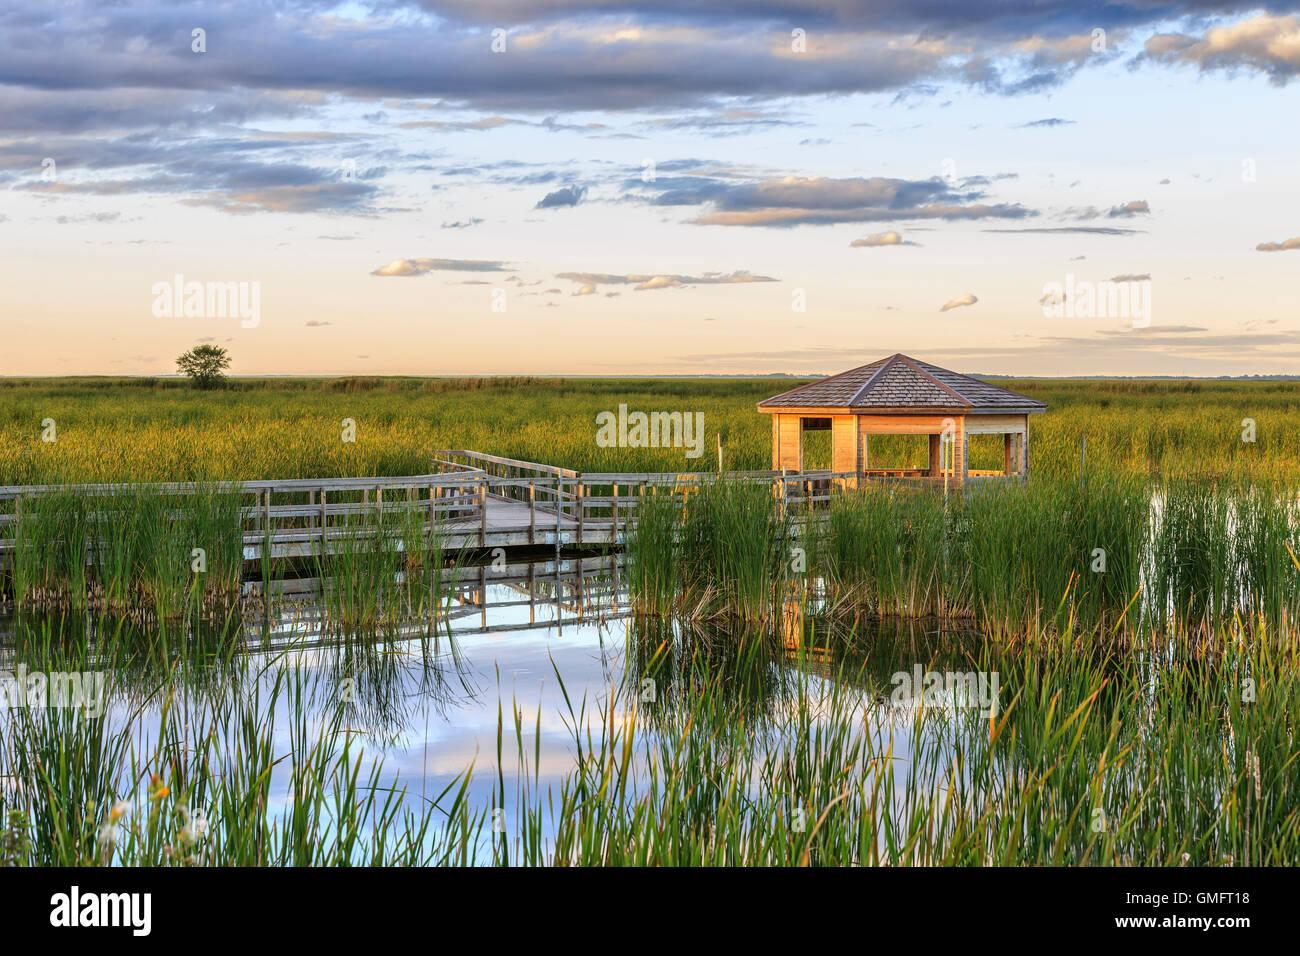 L'observation de la faune, aveugle Le marais Oak Hammock, Manitoba, Canada. Photo Stock